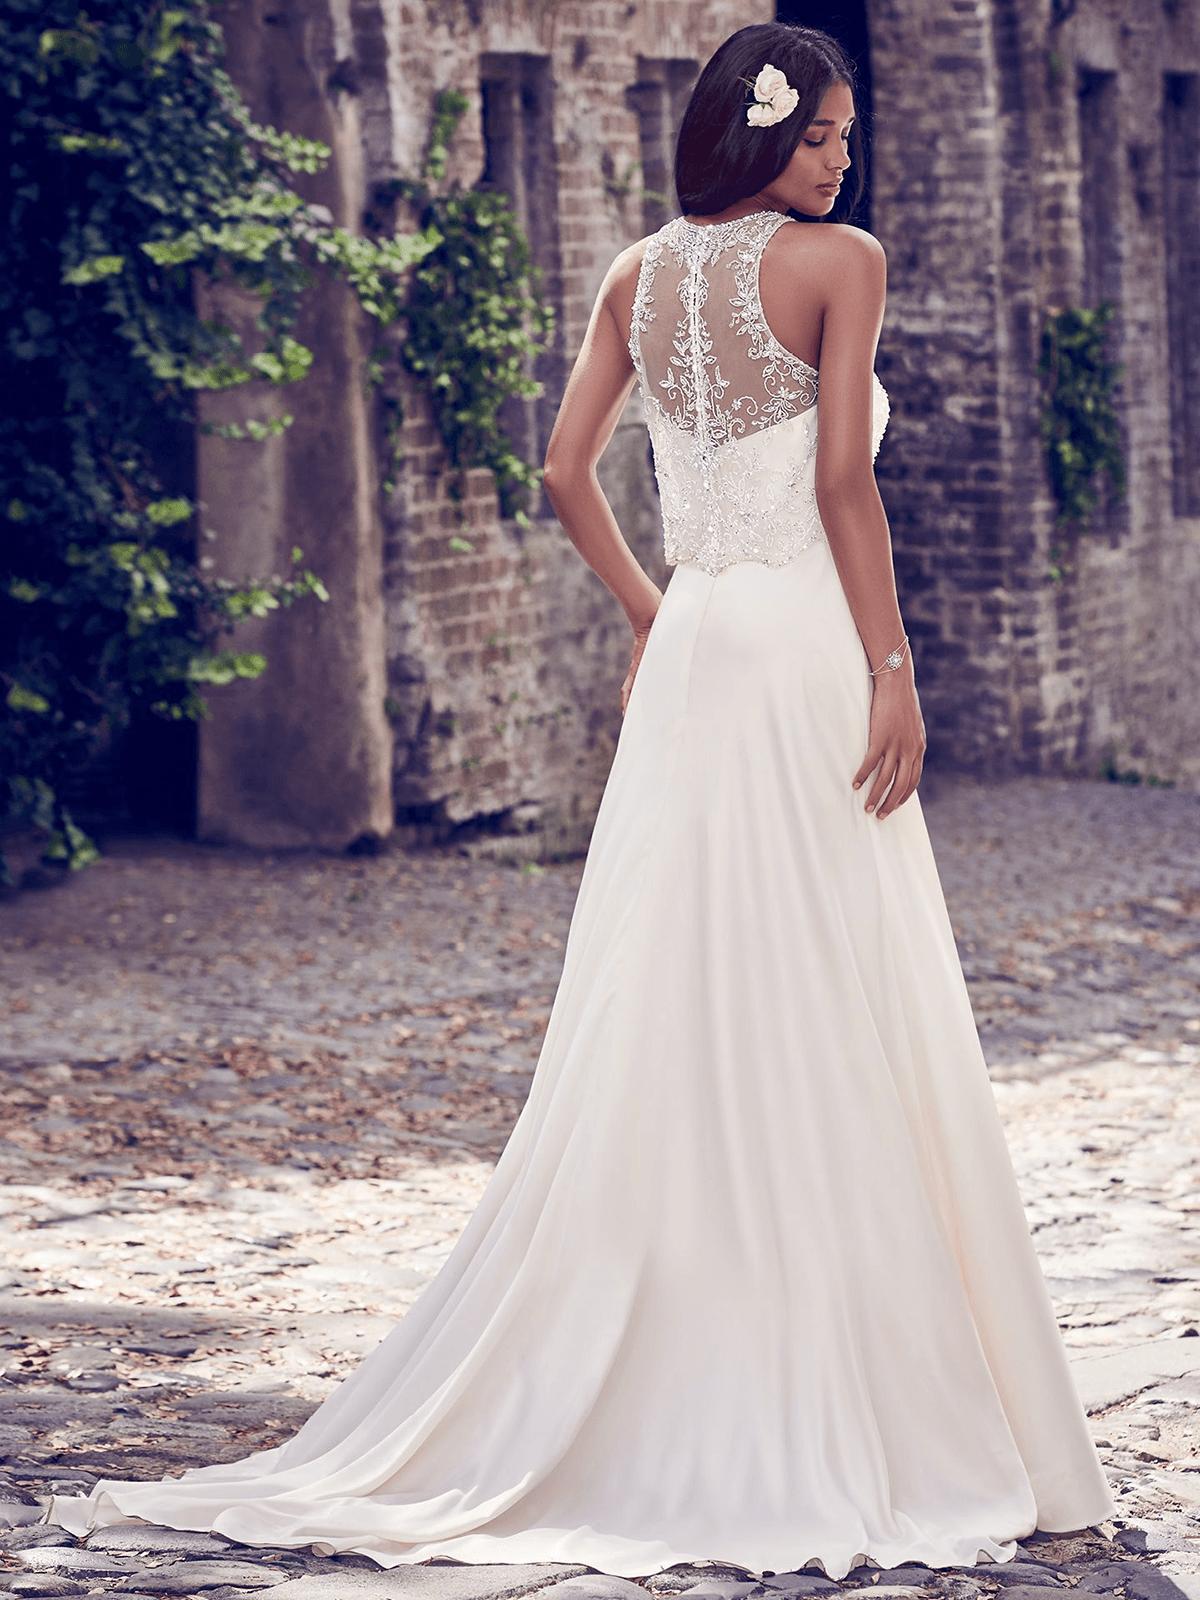 Maggie-Sottero-Wedding-Dress-Larkin-8MT450-Back